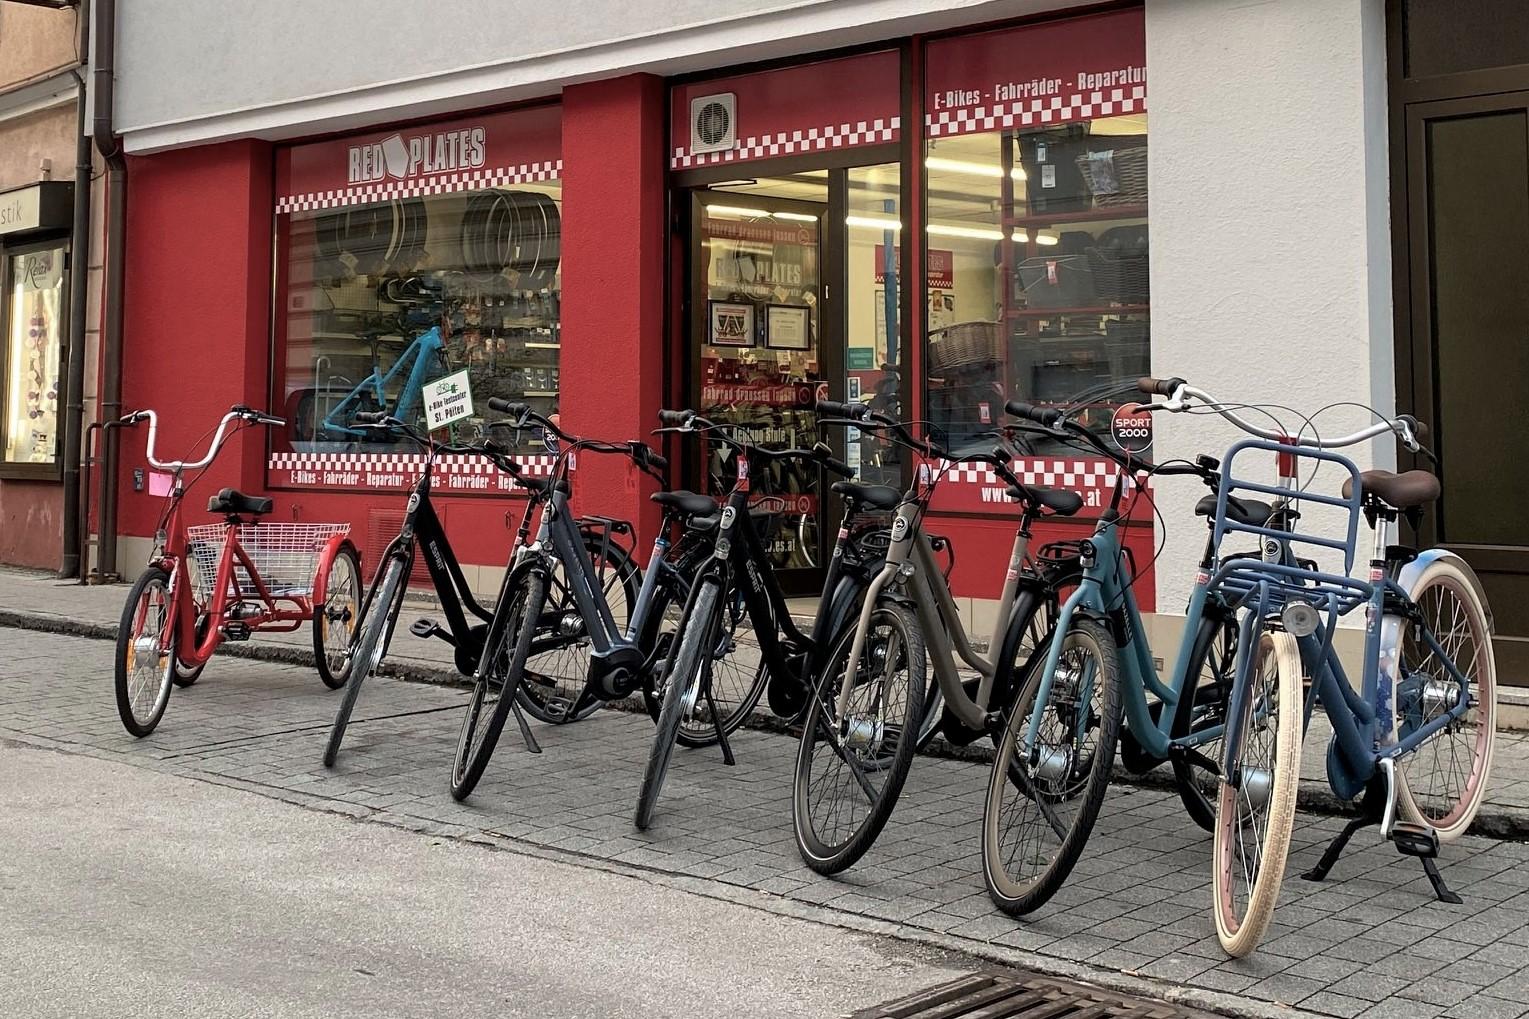 Fahrradservice & Fahrradreparatur Red Plates